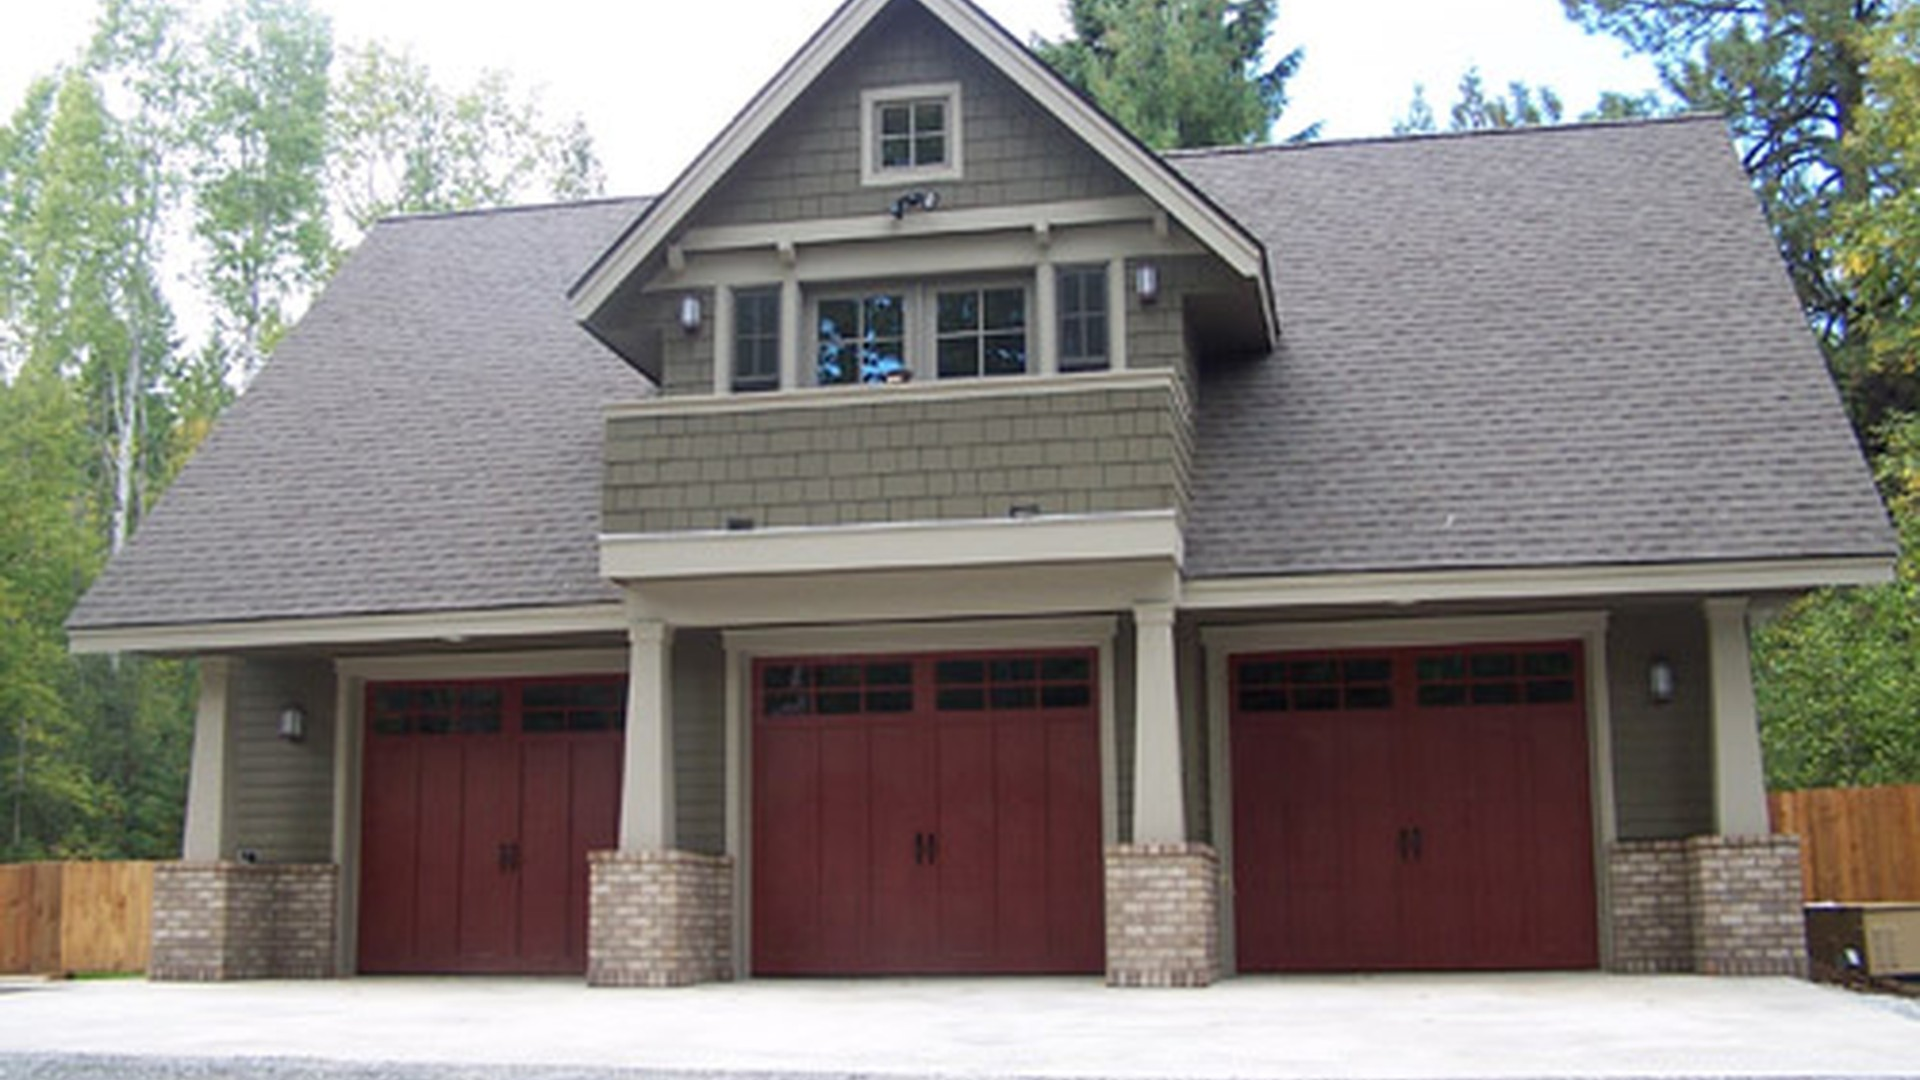 Carriage House House Plan 5016 The Athena 908 Sqft 2